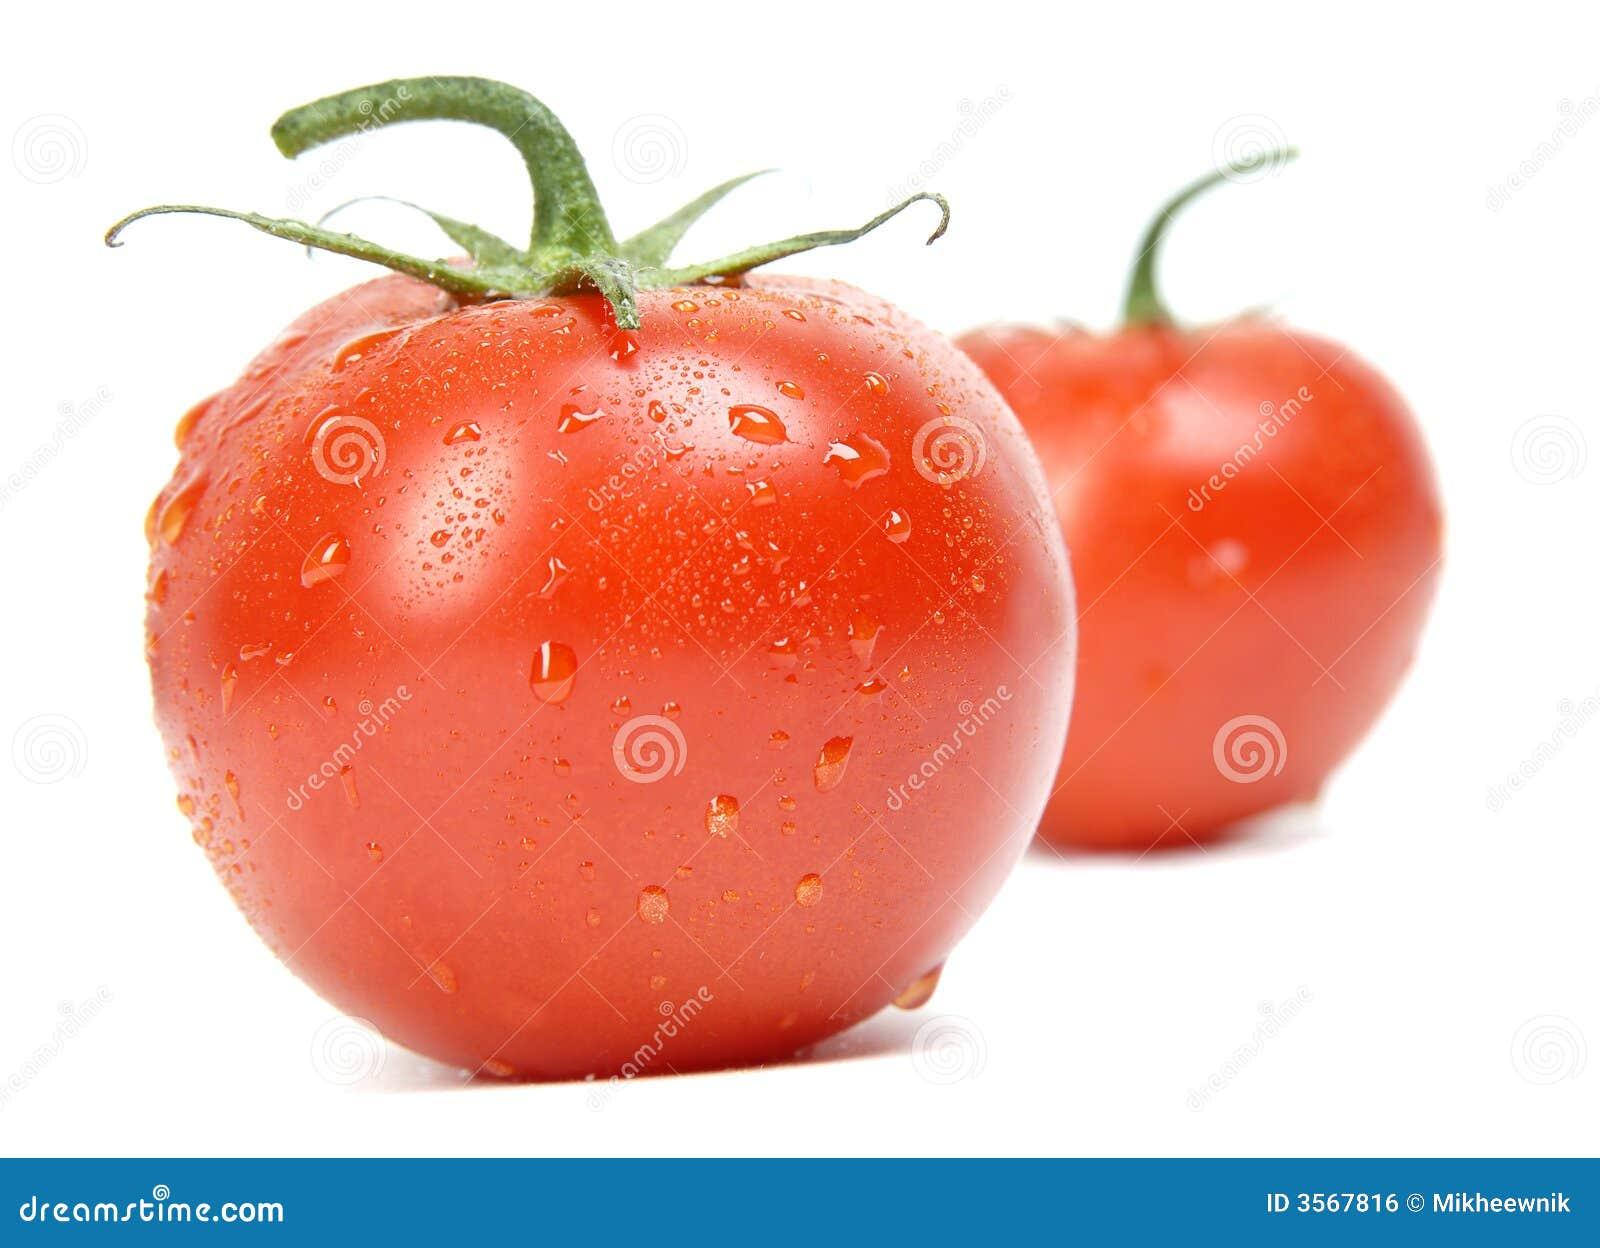 Pomodoro isolato